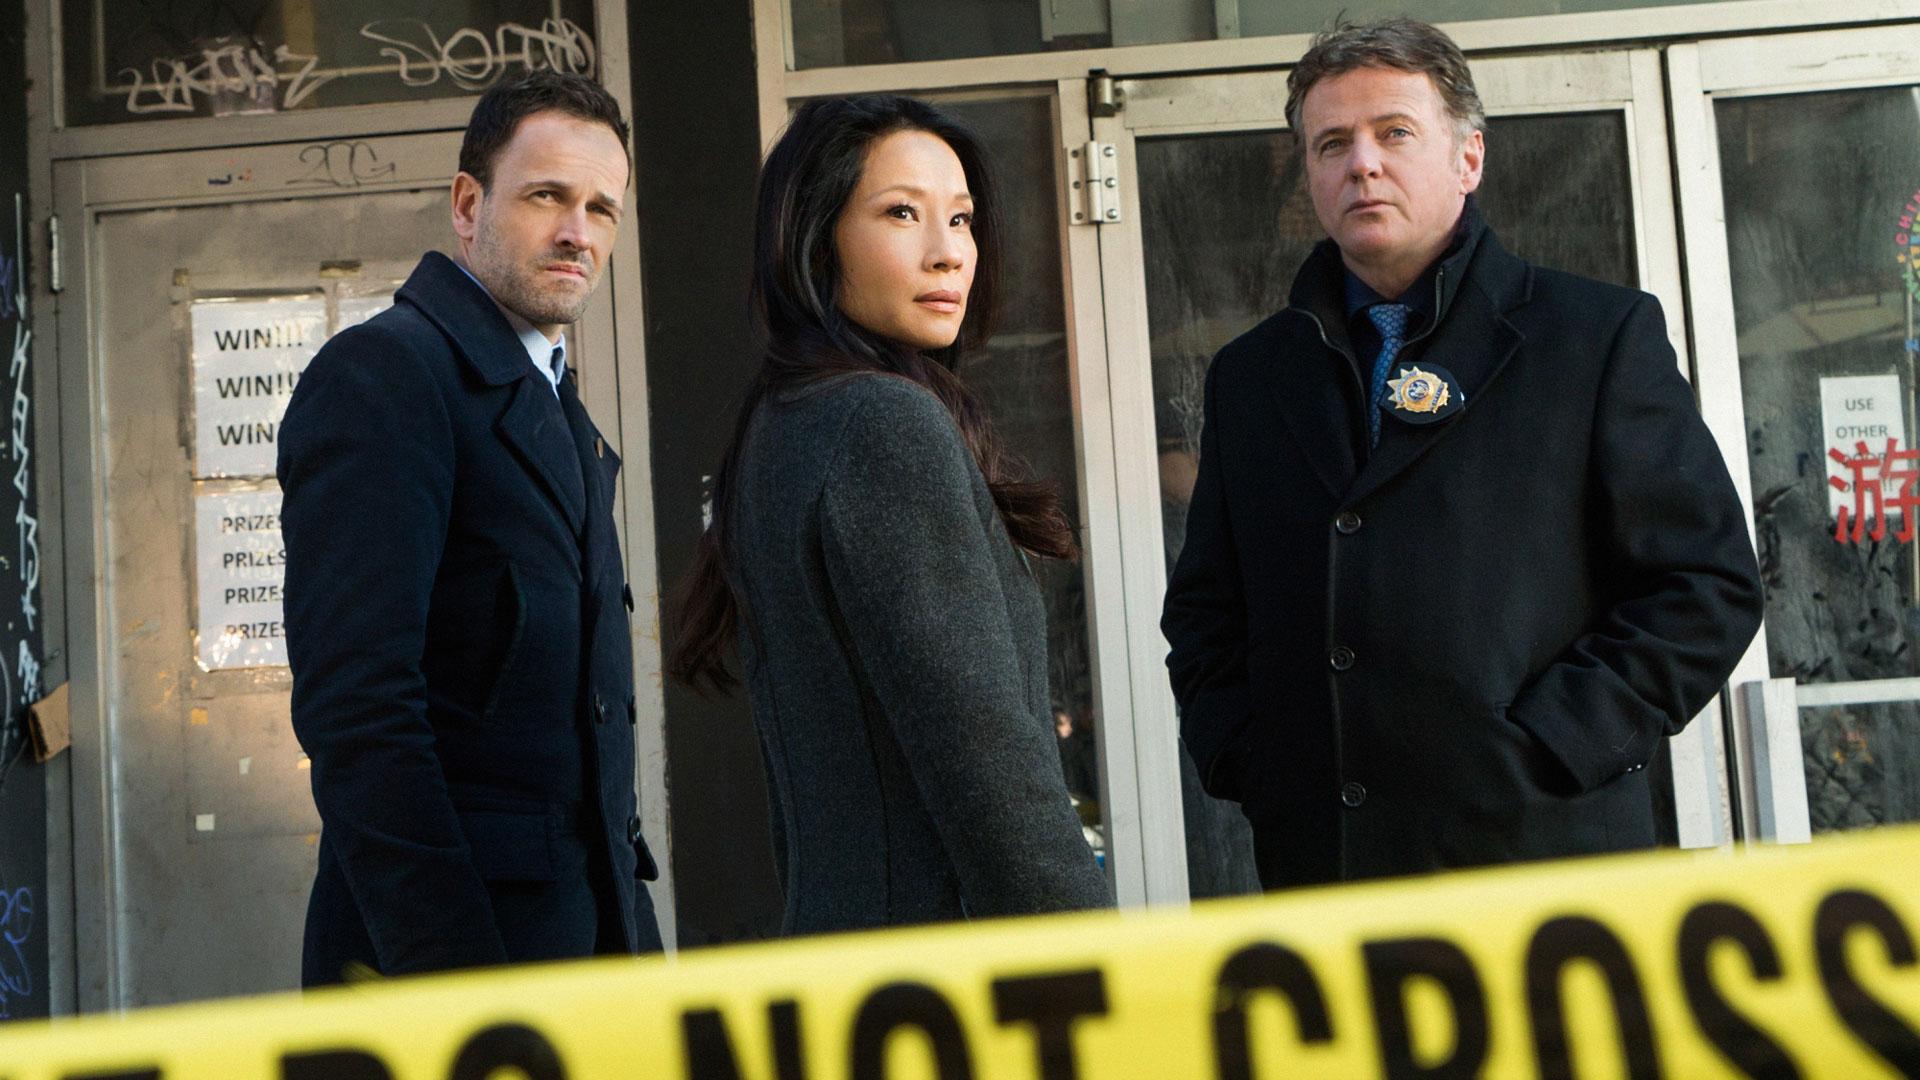 Elementary Season 4 finale airs on Sunday, May 8 at 10/9c.